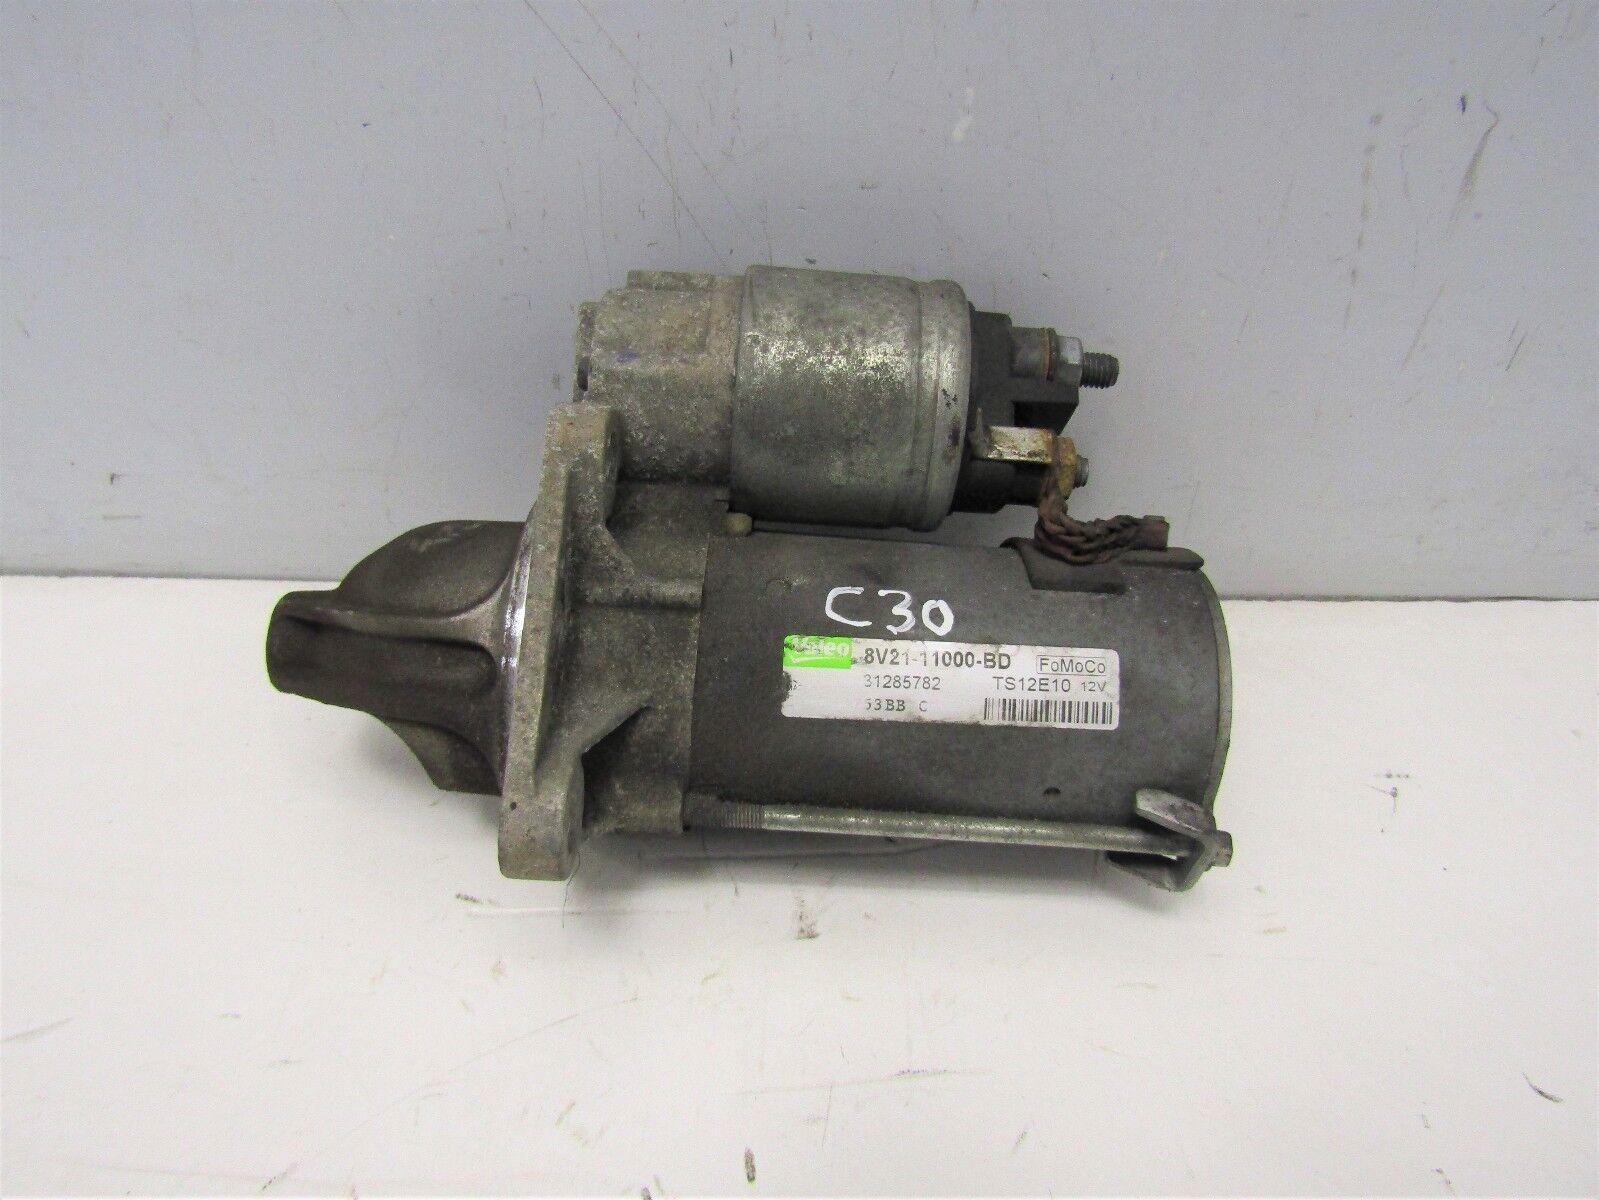 VOLVO C30 2010-12 STARTER MOTOR (1.6l 16v Petrol B4164S3) 31285782        #2367V